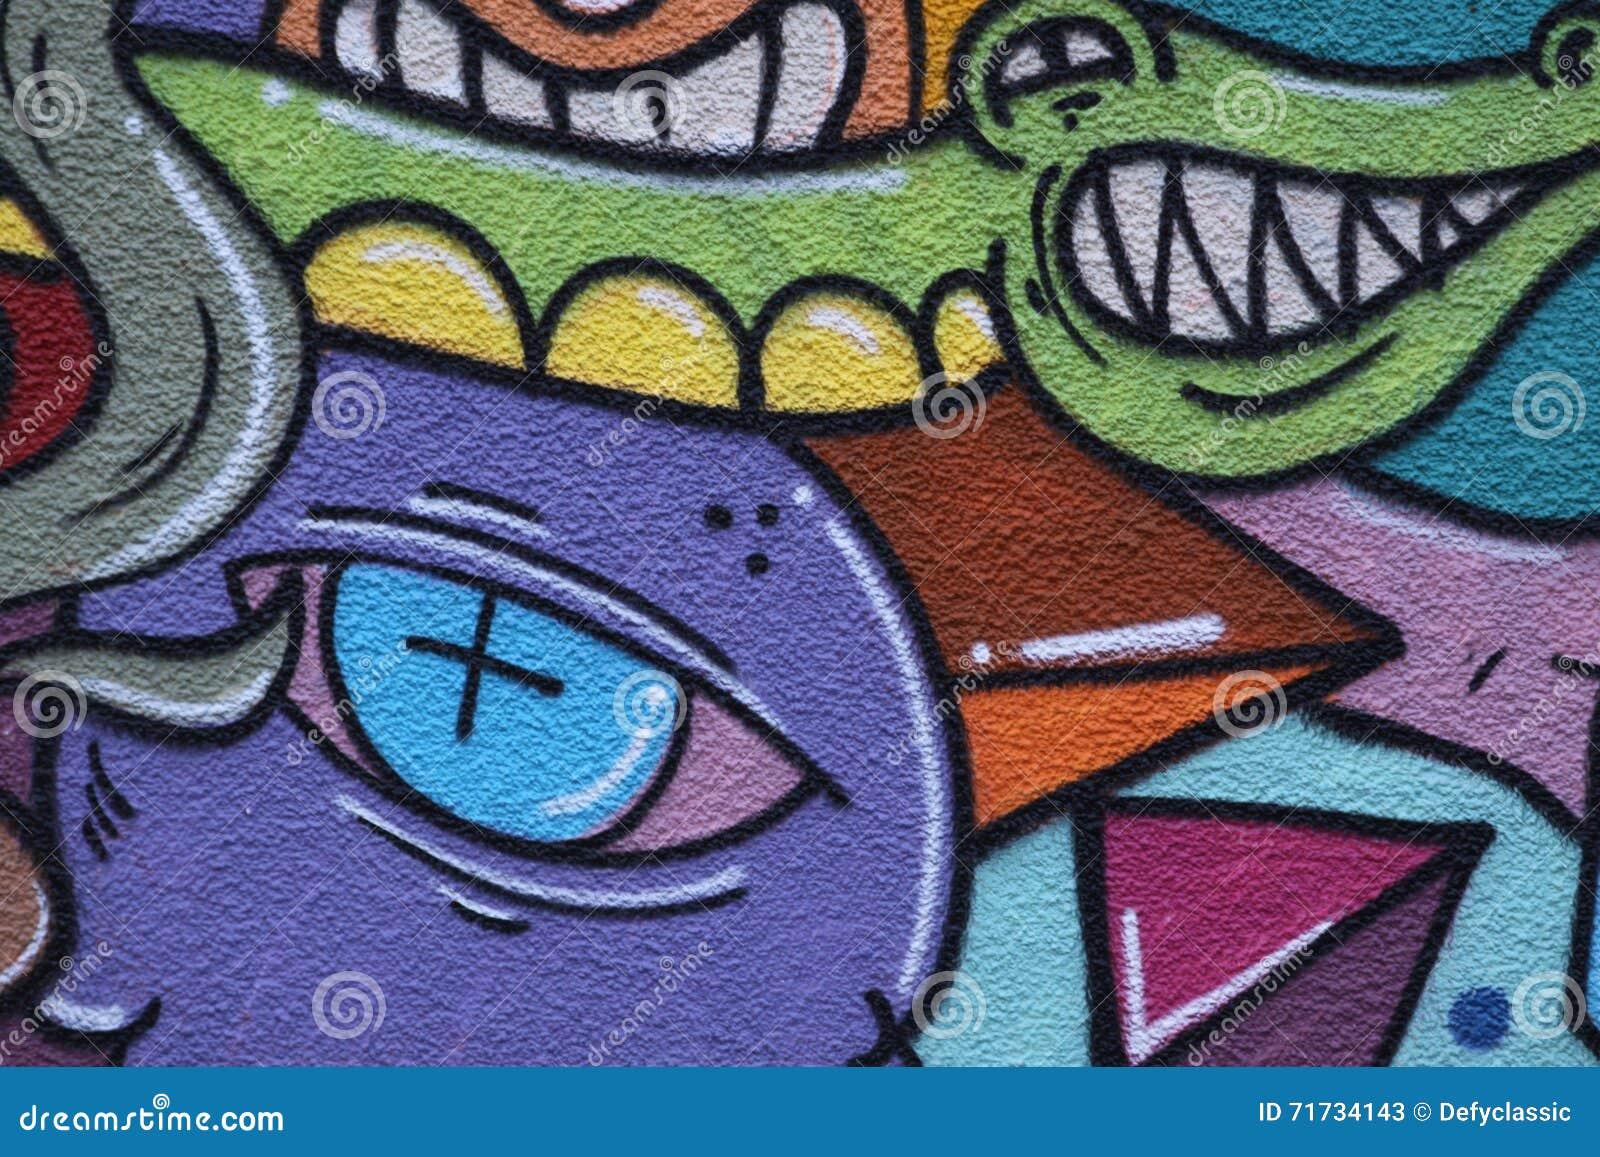 Graffiti -Street Art